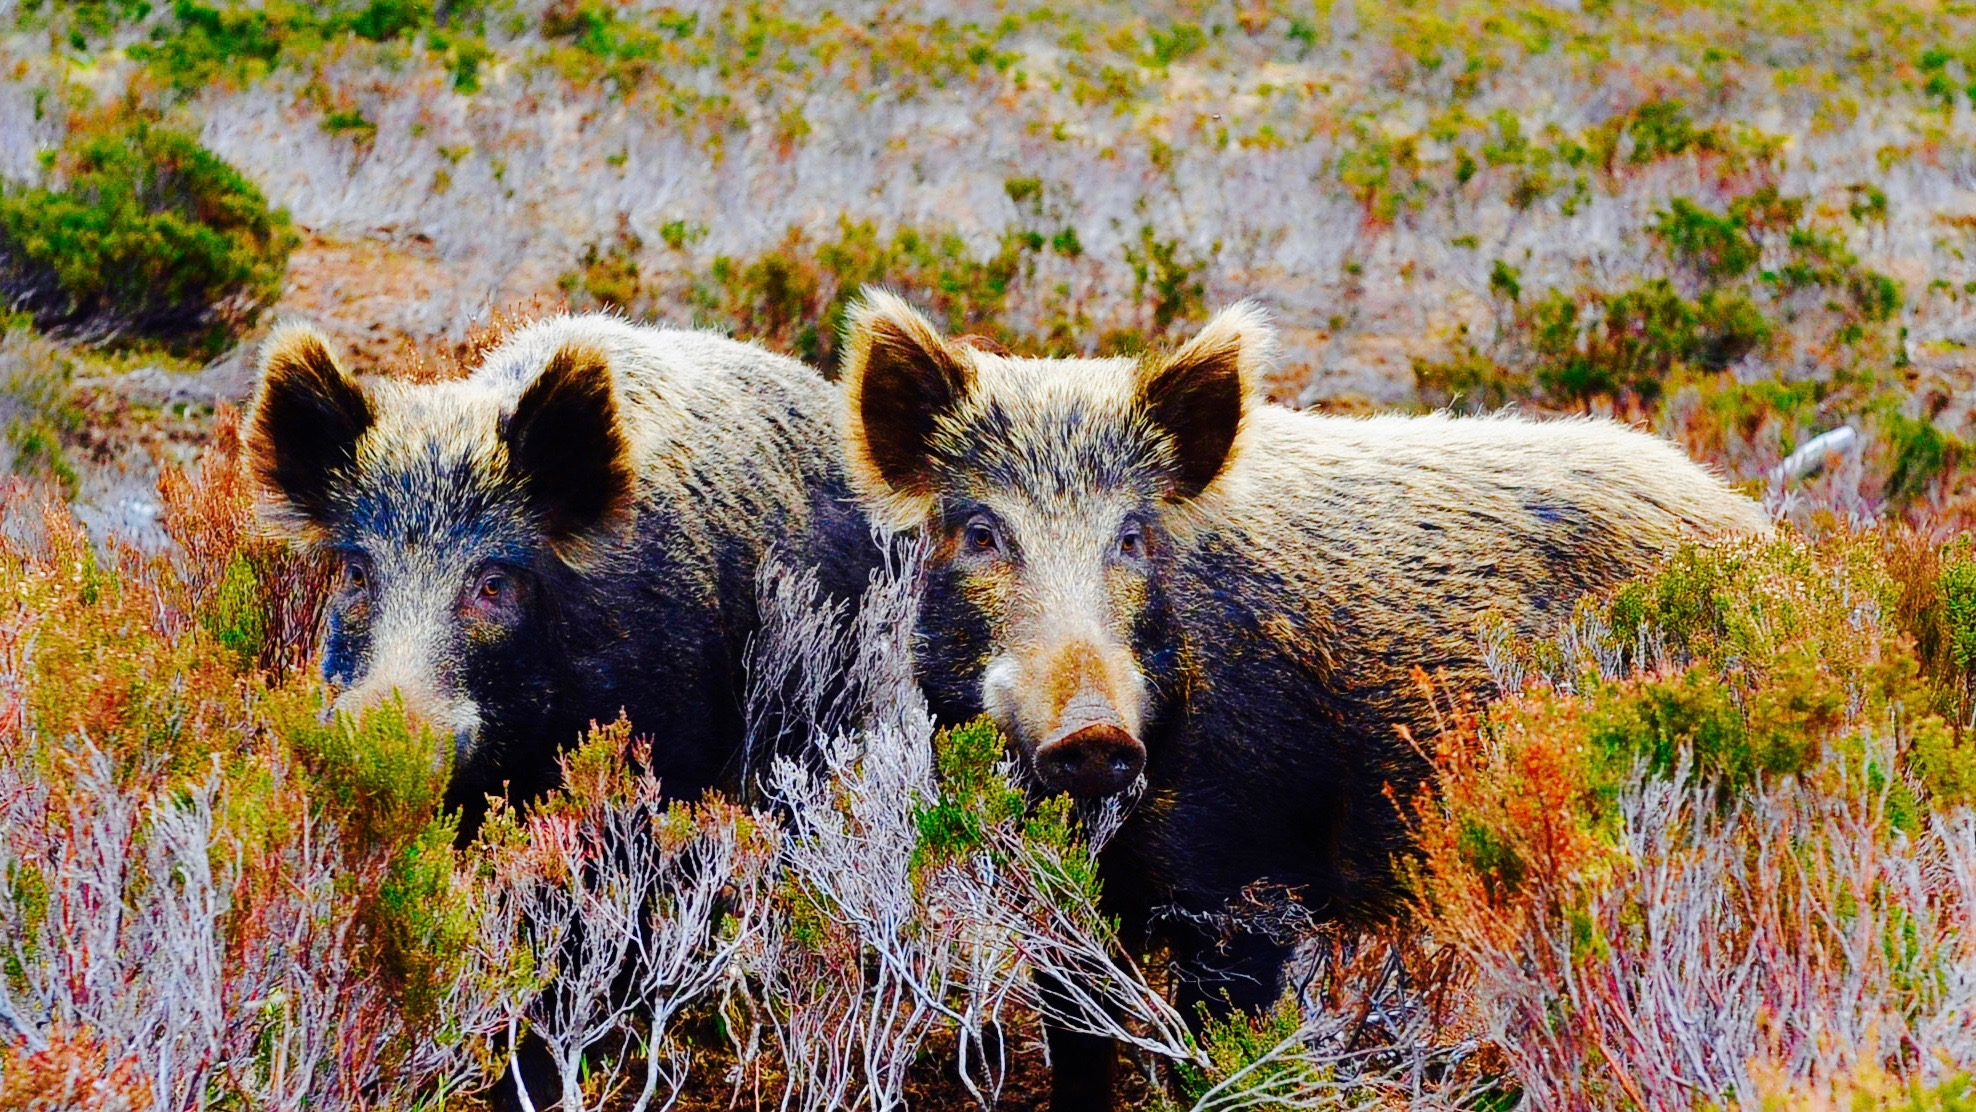 Wild boars in the wild.